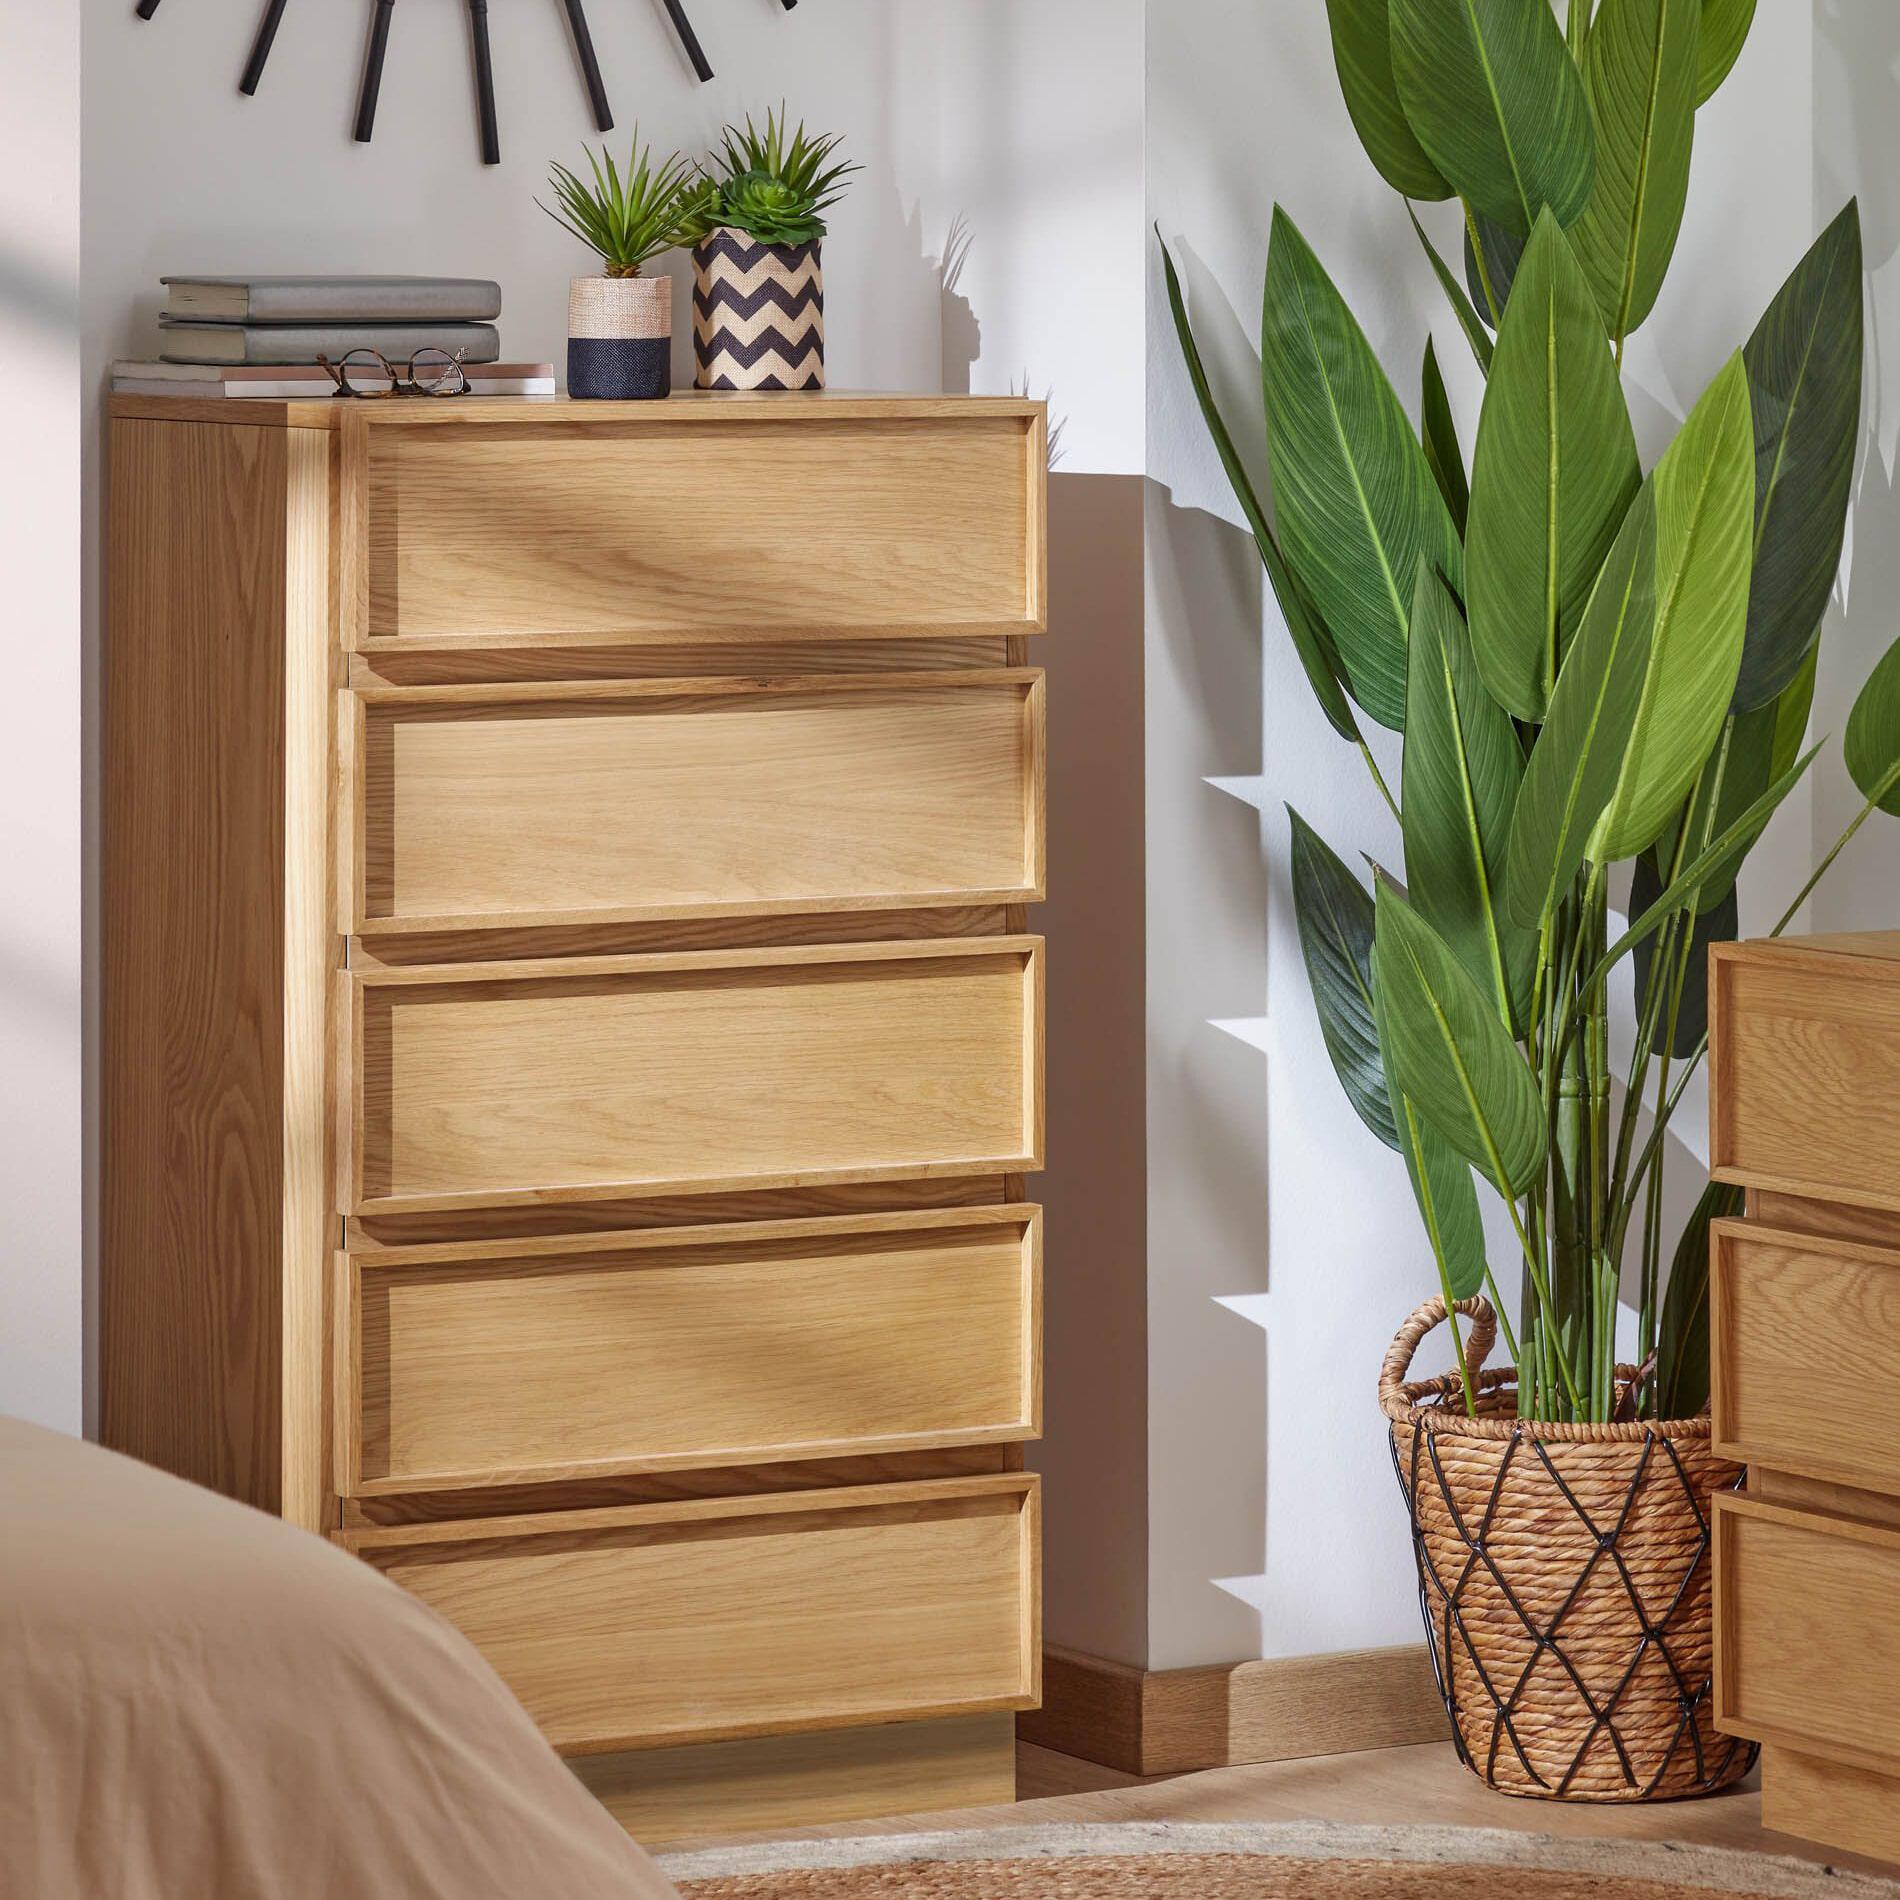 Kave Home Ladenkast 'Taiana' Eiken, 60 x 110cm